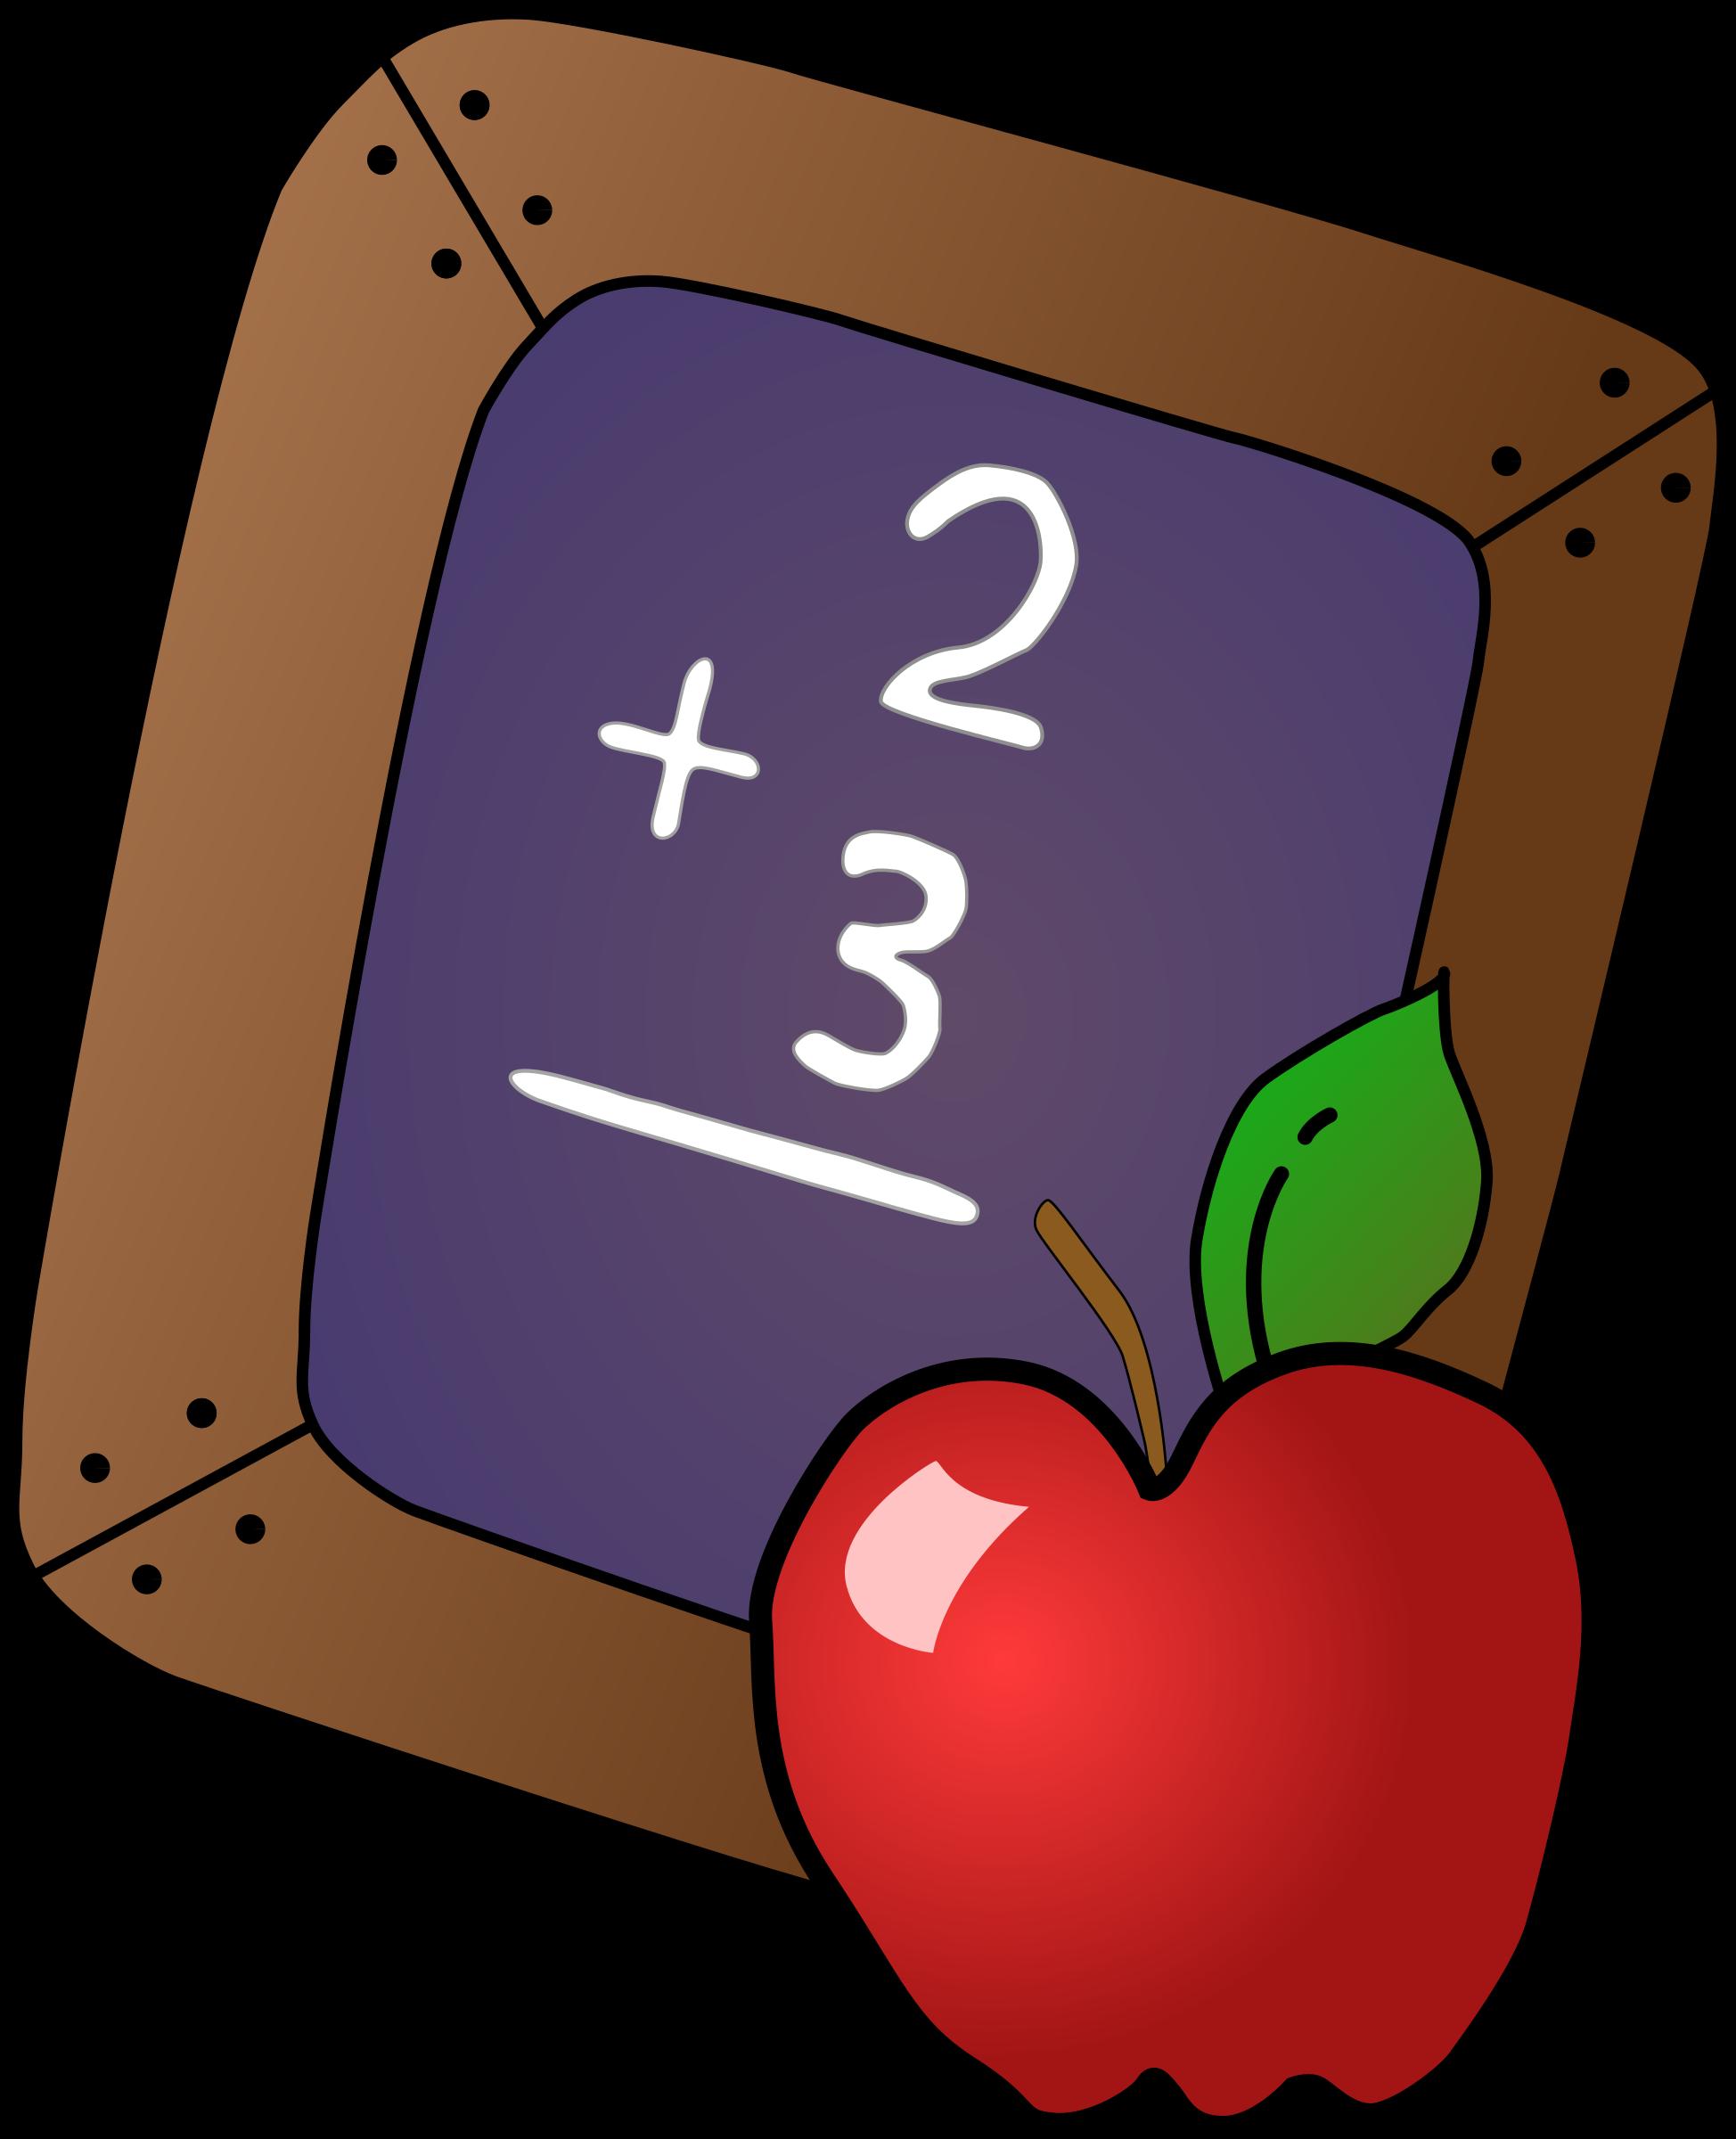 Teacher apple clipart no background free Apple teacher • Pearlcatchers free